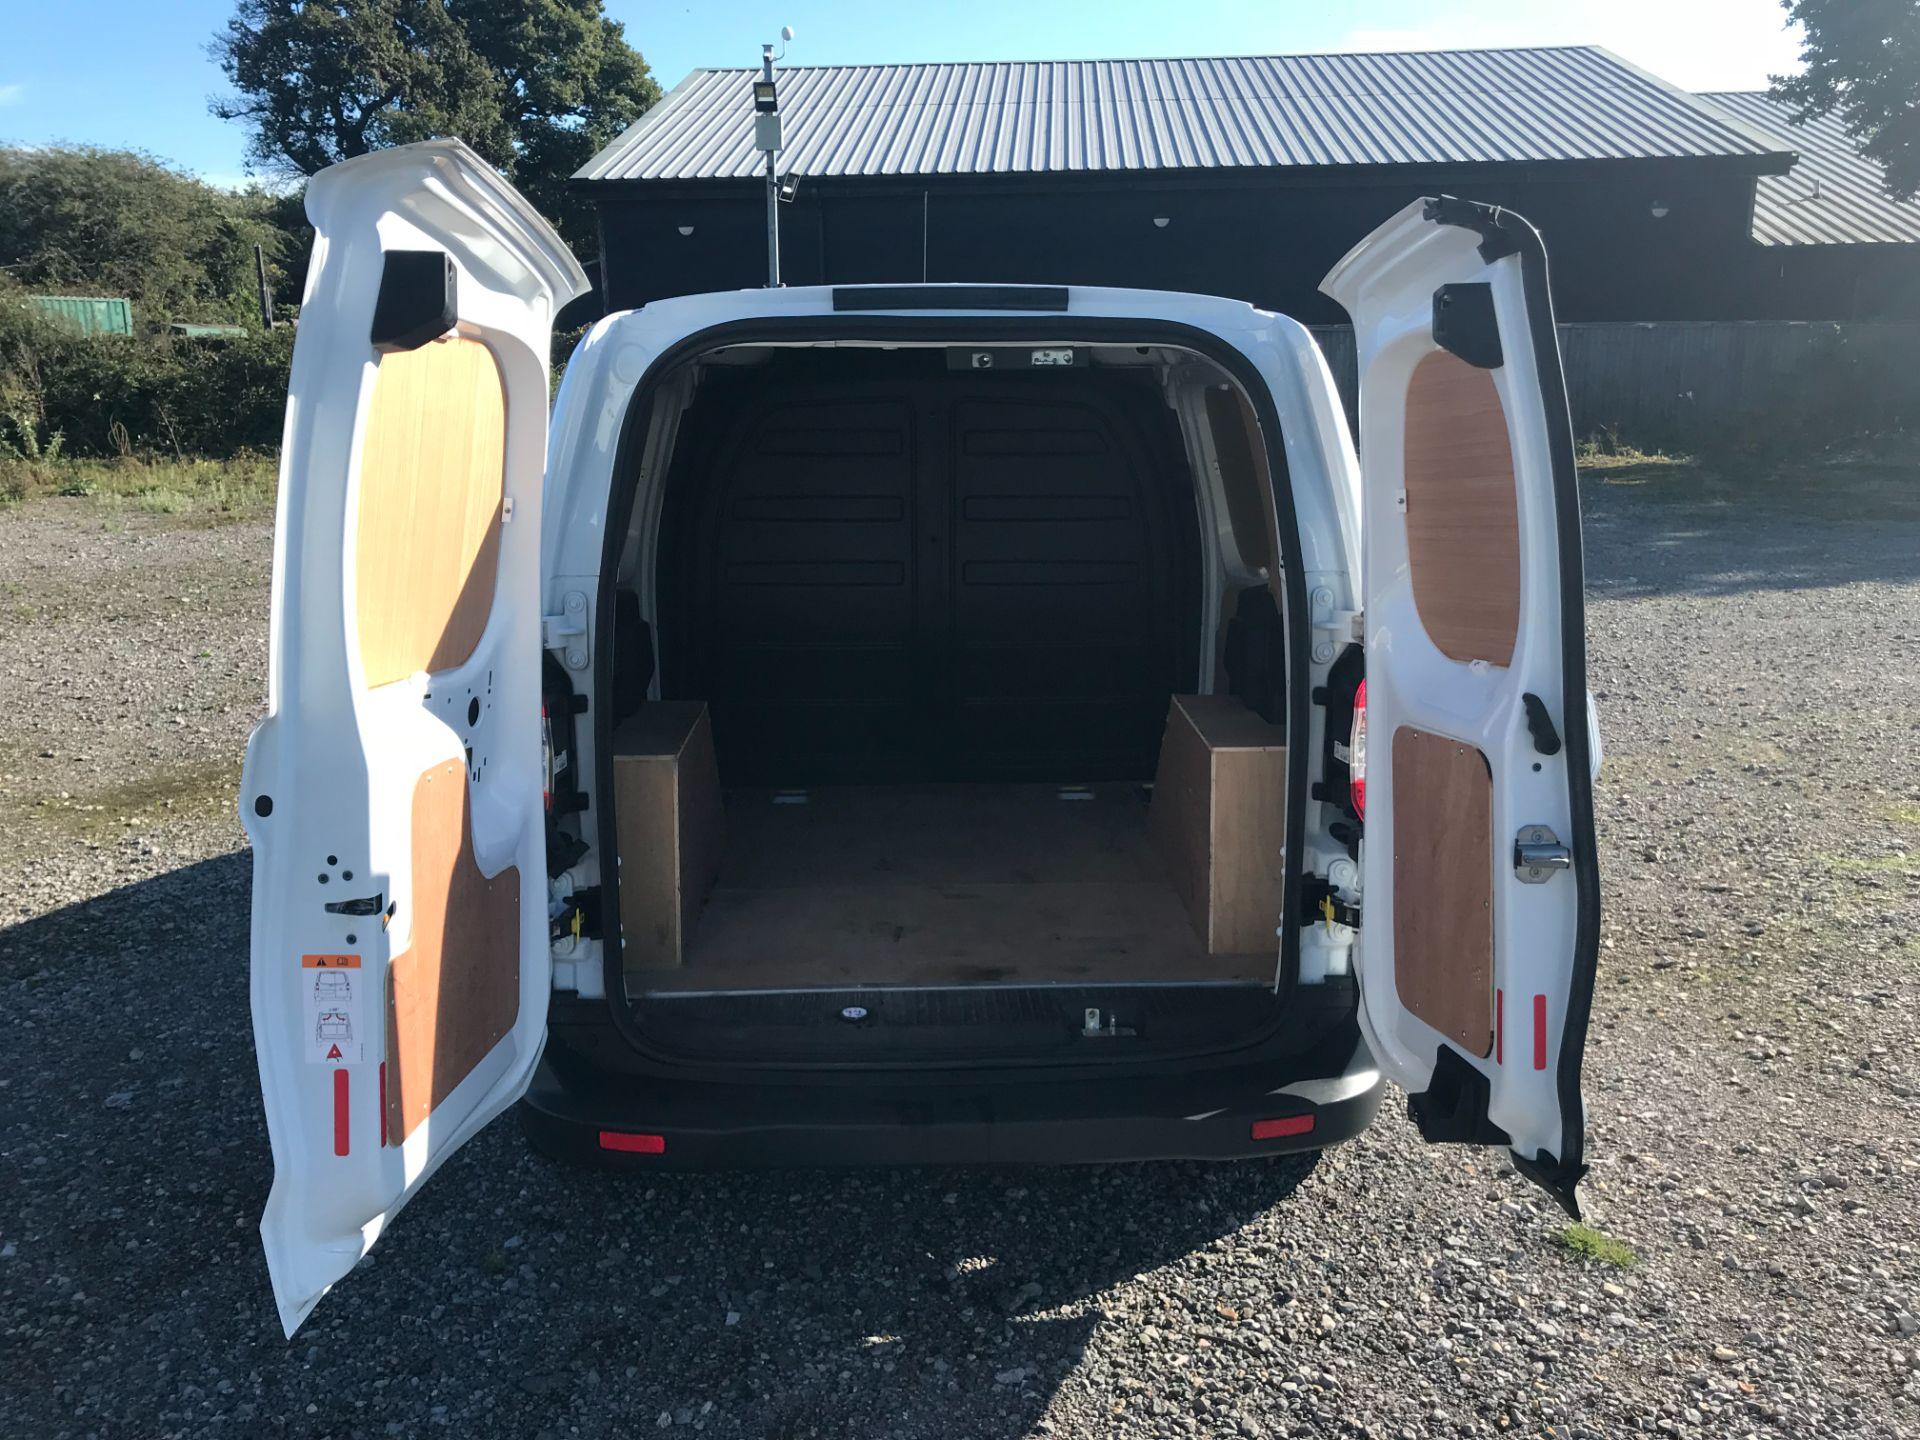 2019 Ford Transit Courier 1.5 Tdci Van Euro 6 (BL69RJZ) Image 9